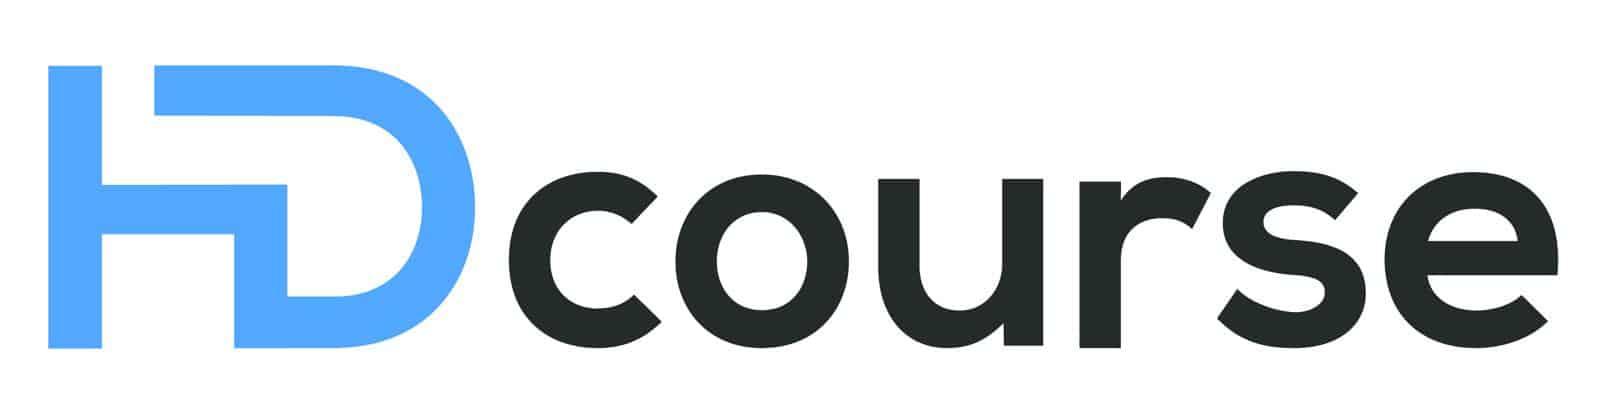 Coffice 實創篇 - HDcourse上